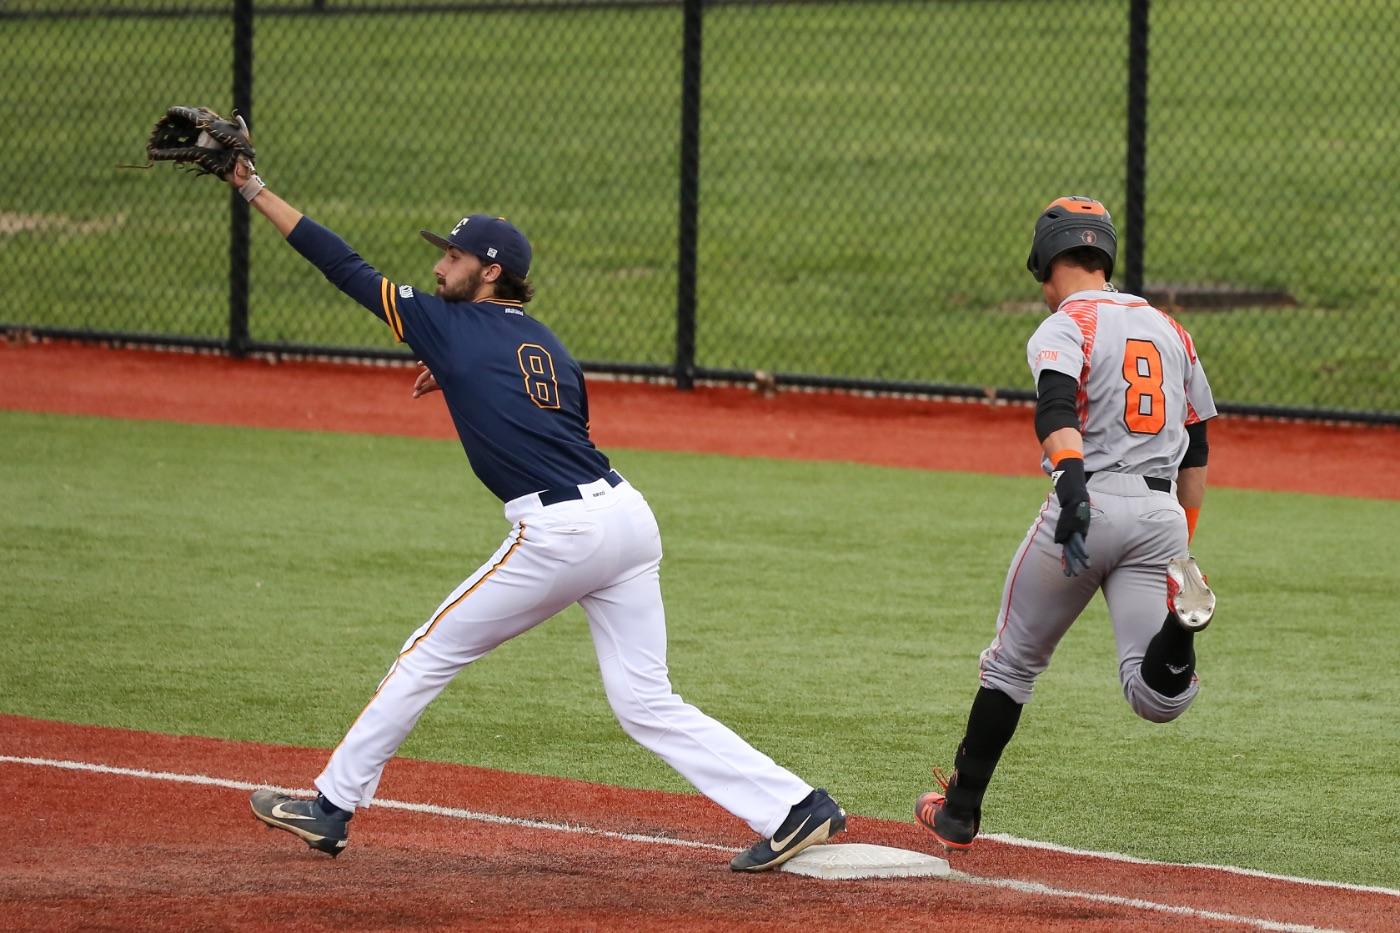 Bucs fall in ninth inning comeback to Mercer